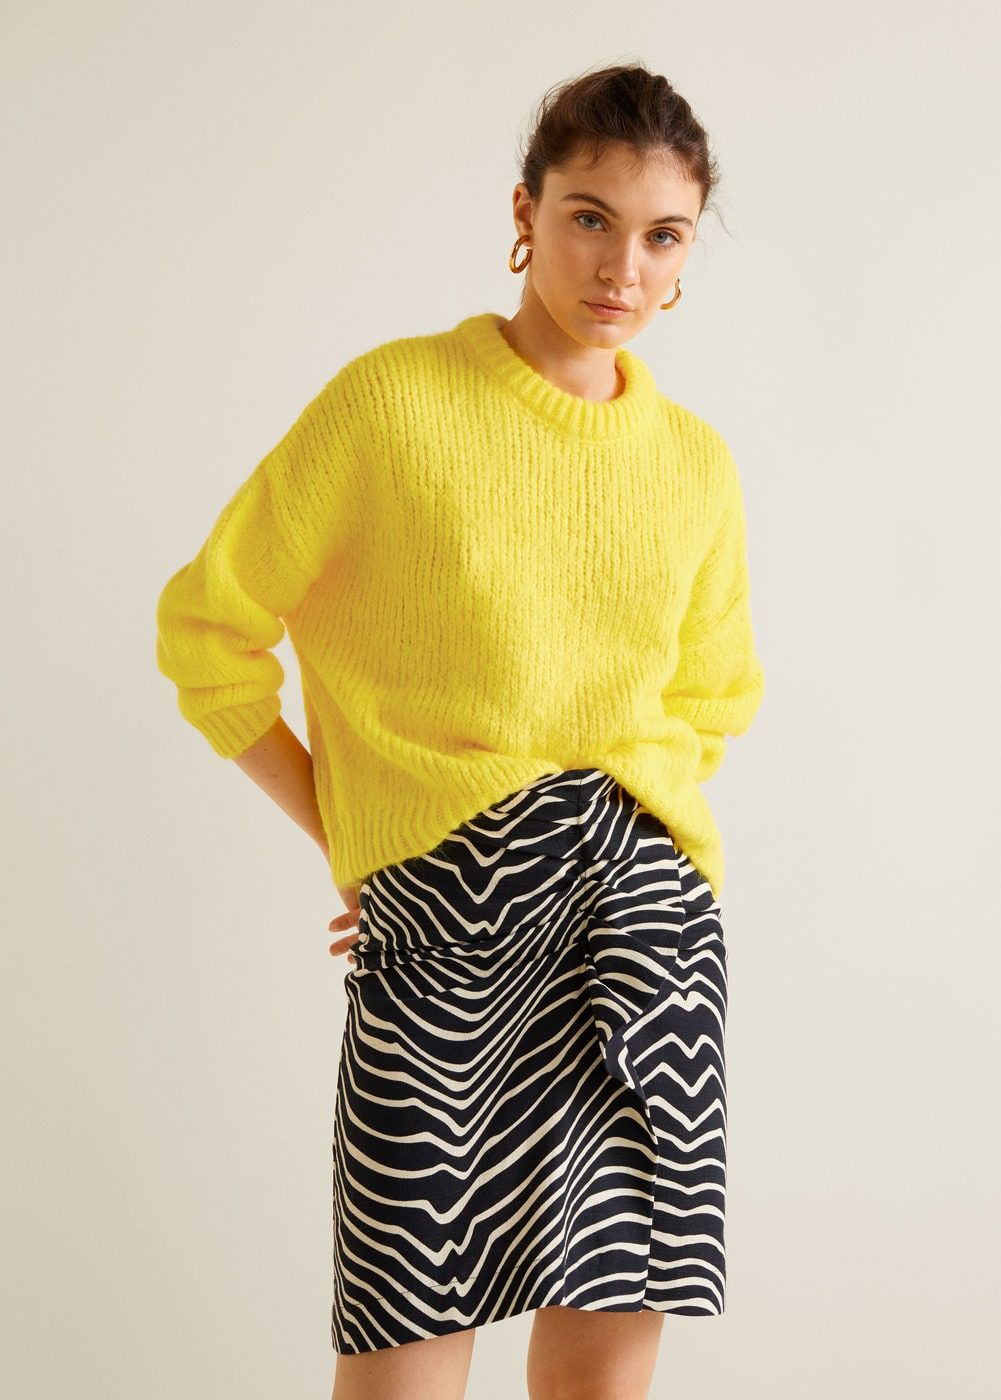 Jersey punto grueso - Cárdigans y jerséis de Mujer  f3a9284f085